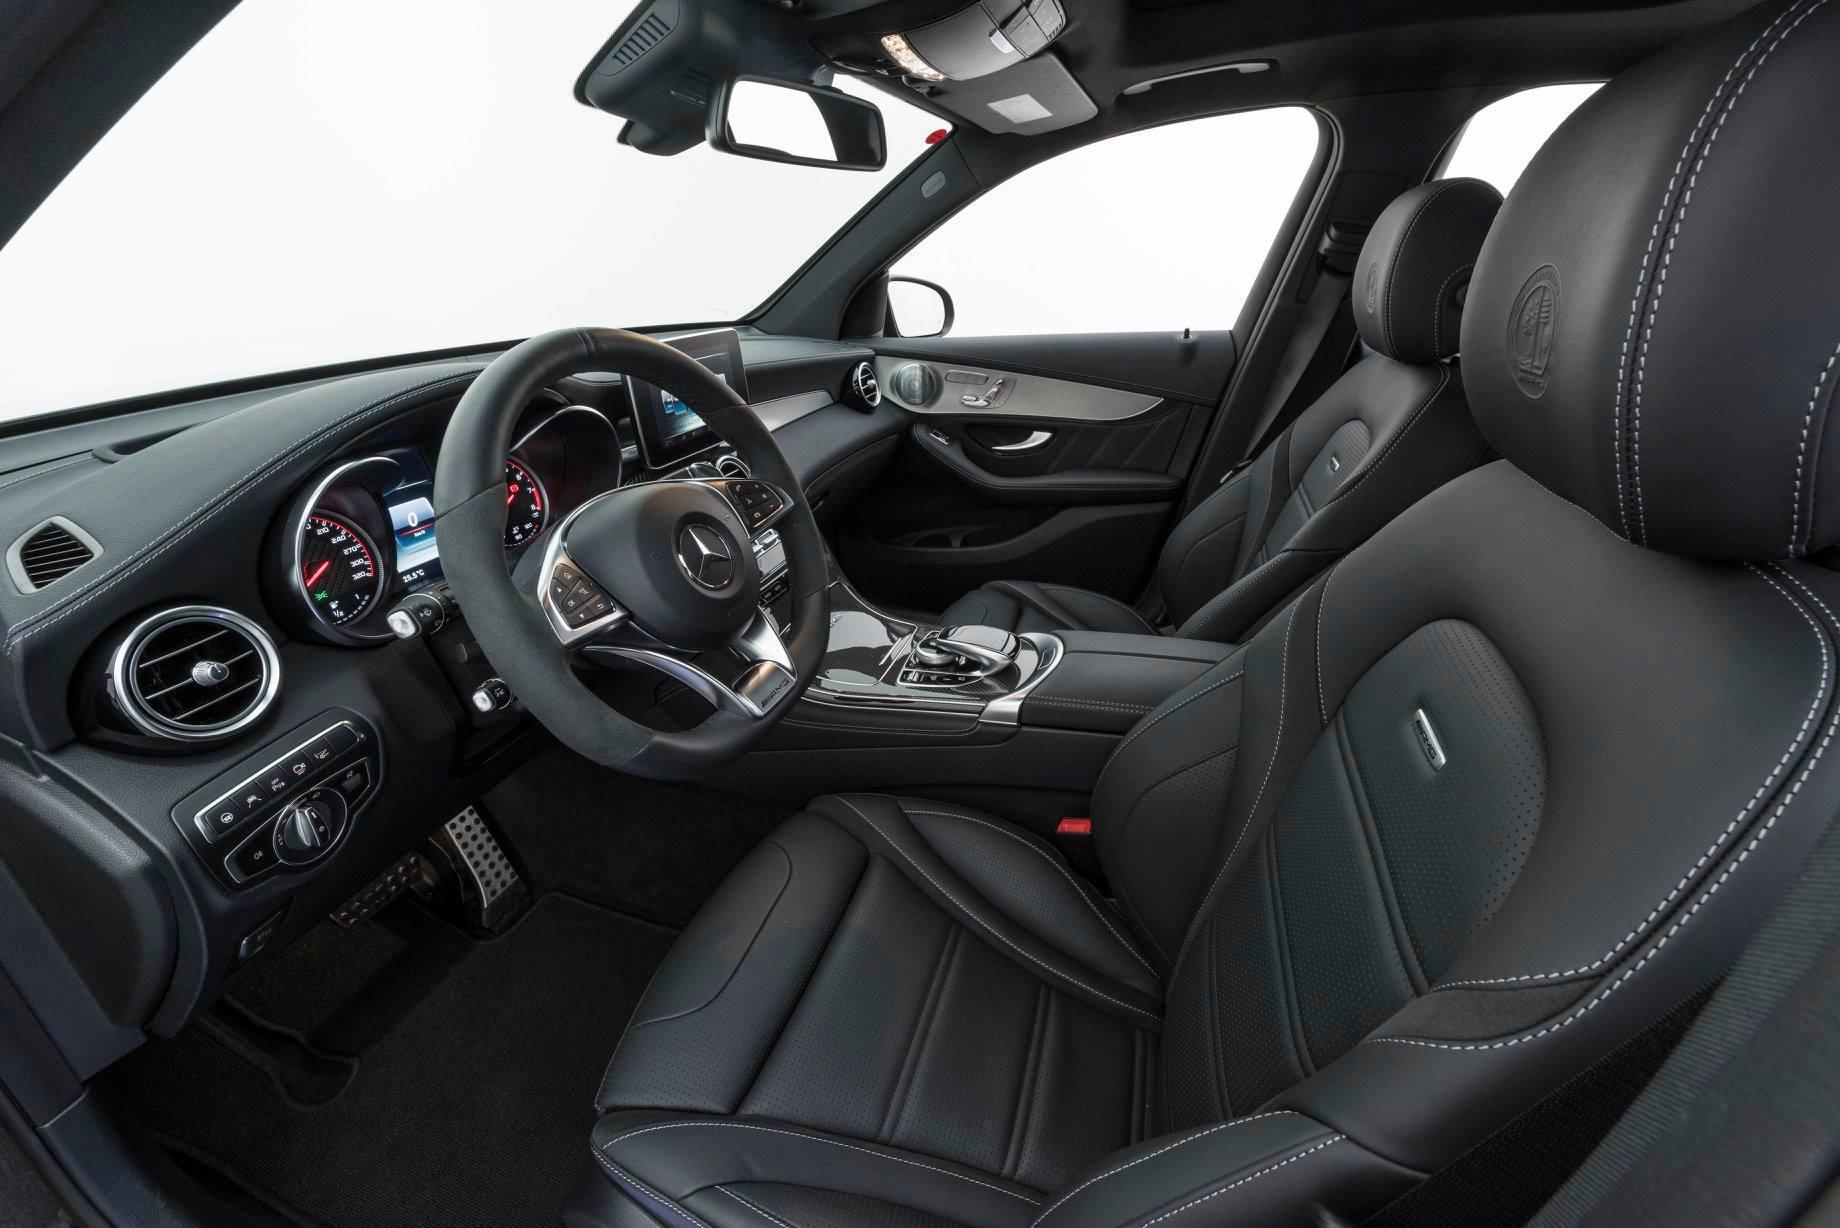 Mercedes-AMG GLC 63 S BRABUS 600